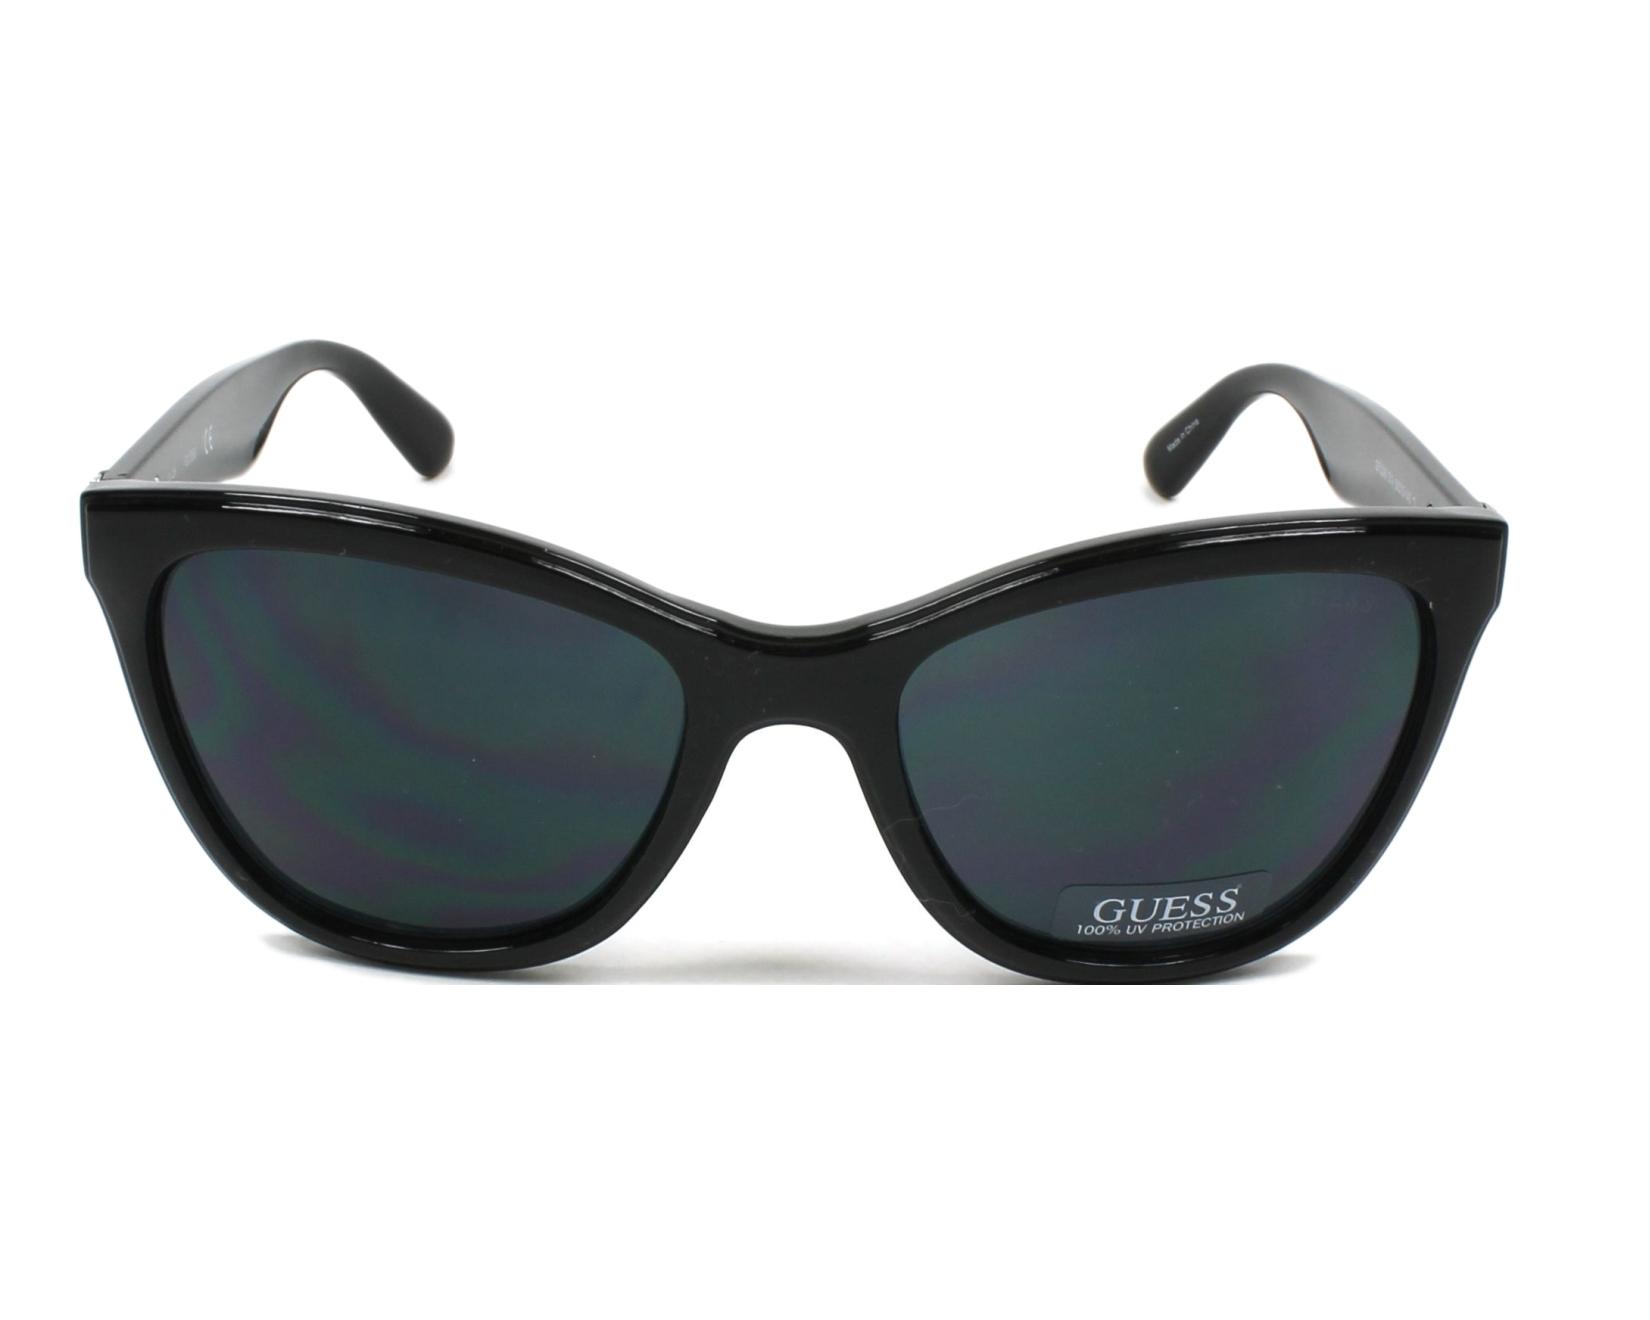 lunettes de soleil femme verres bleus david simchi levi. Black Bedroom Furniture Sets. Home Design Ideas